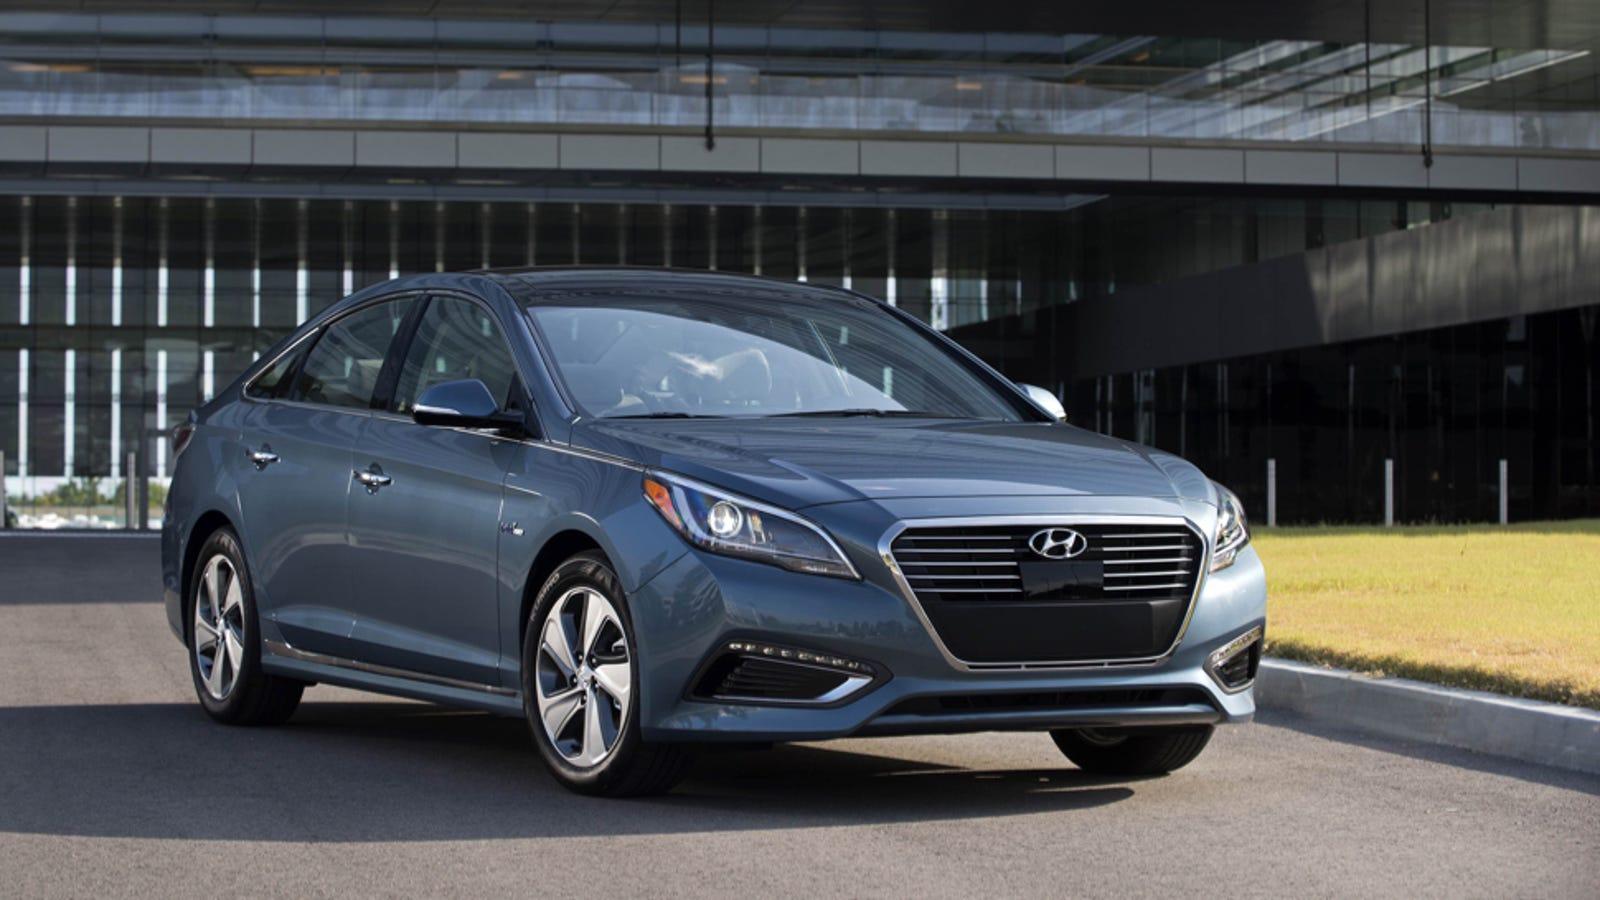 Hyundai Sonata: If you have a flat tire